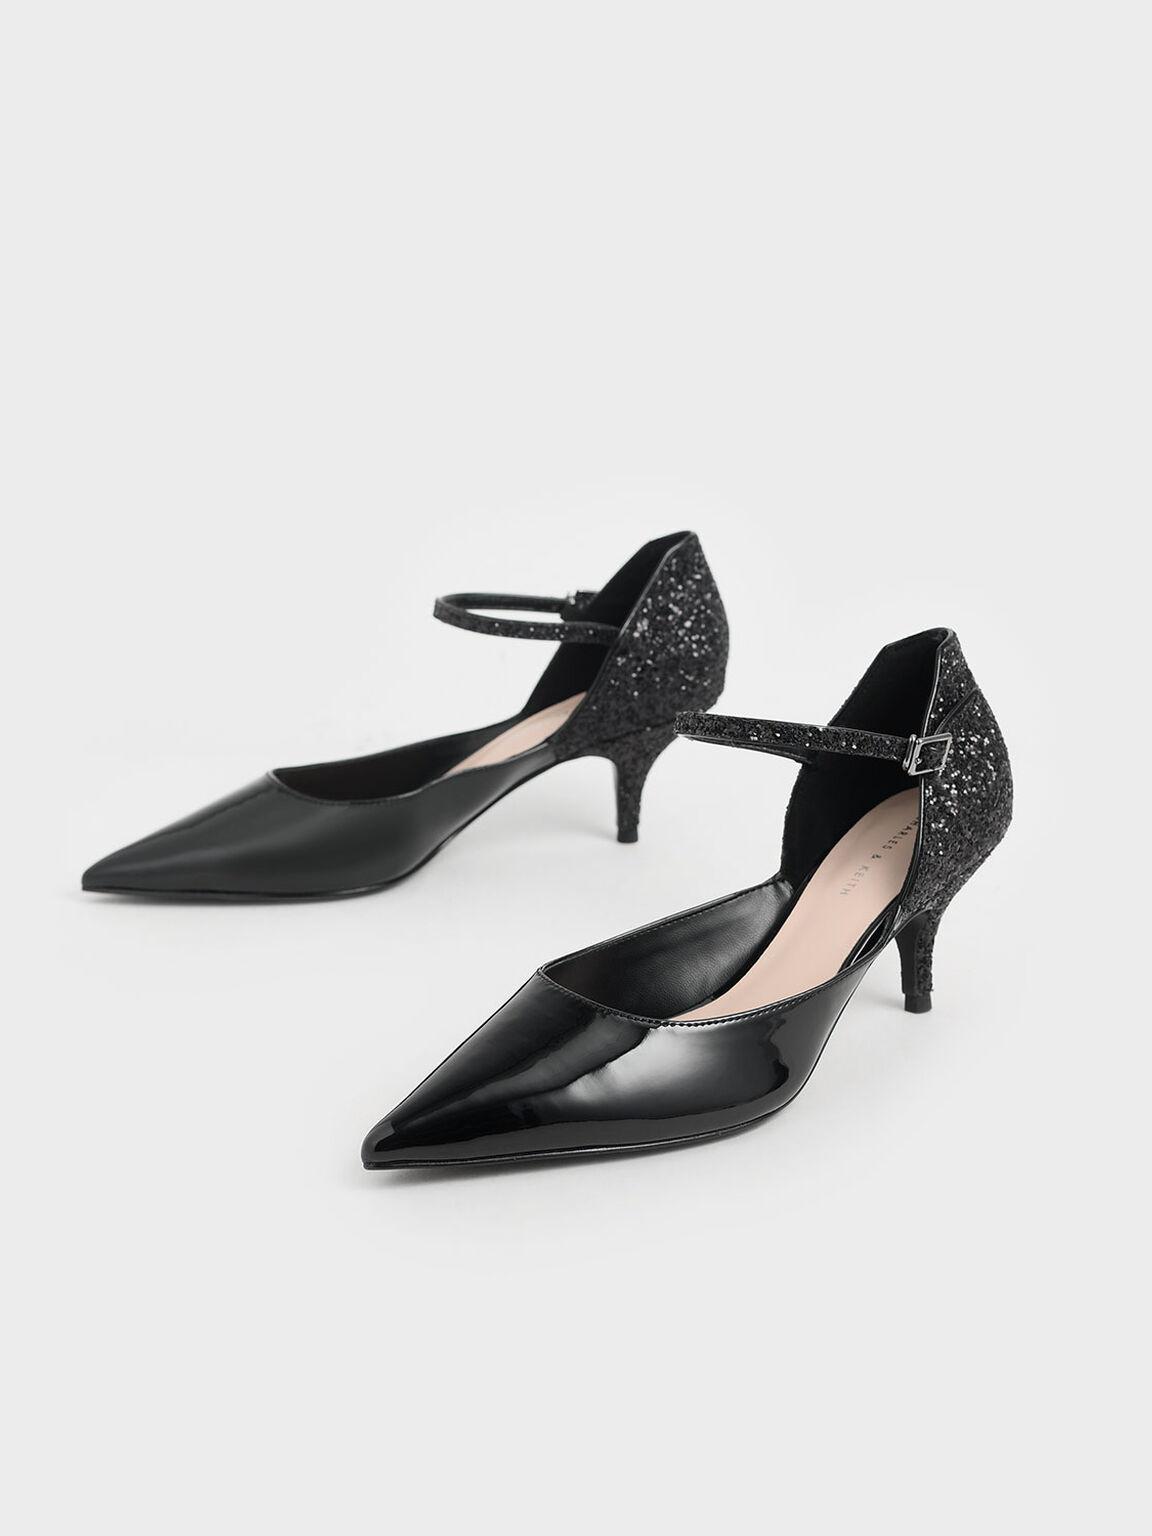 Patent Glitter Kitten Heel Pumps, Black, hi-res